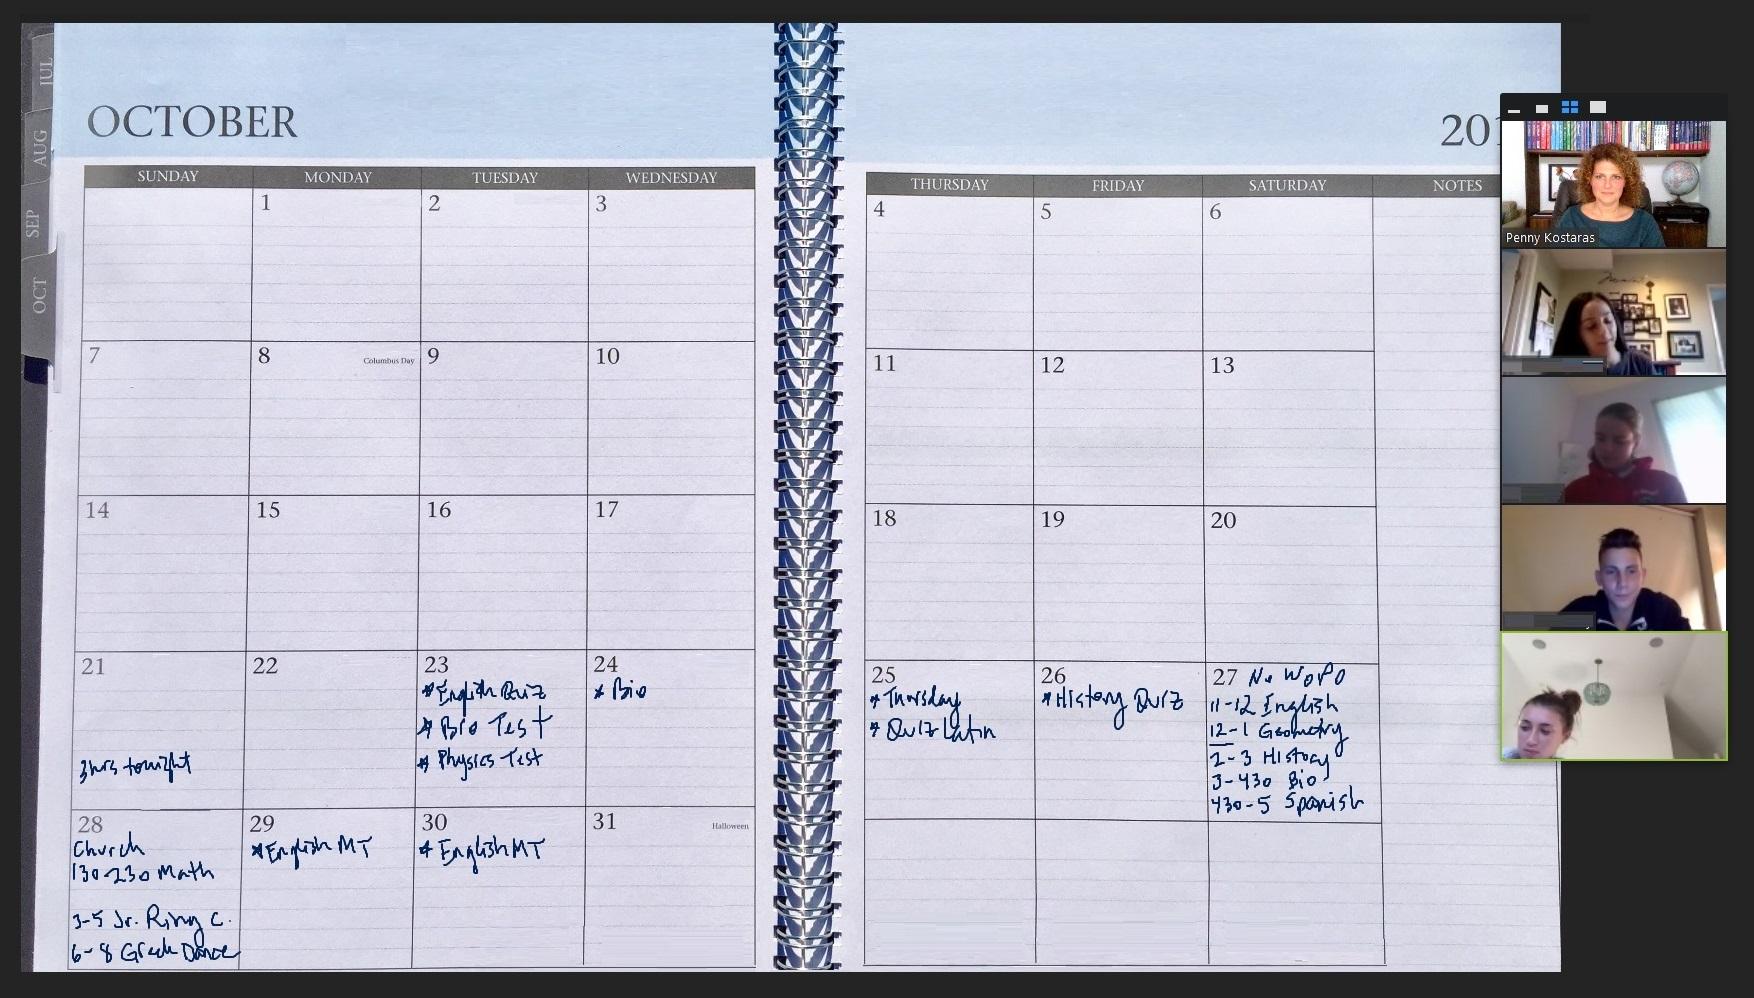 Penny Kostaras Wise Student Website Online Monthly Calendar.jpg